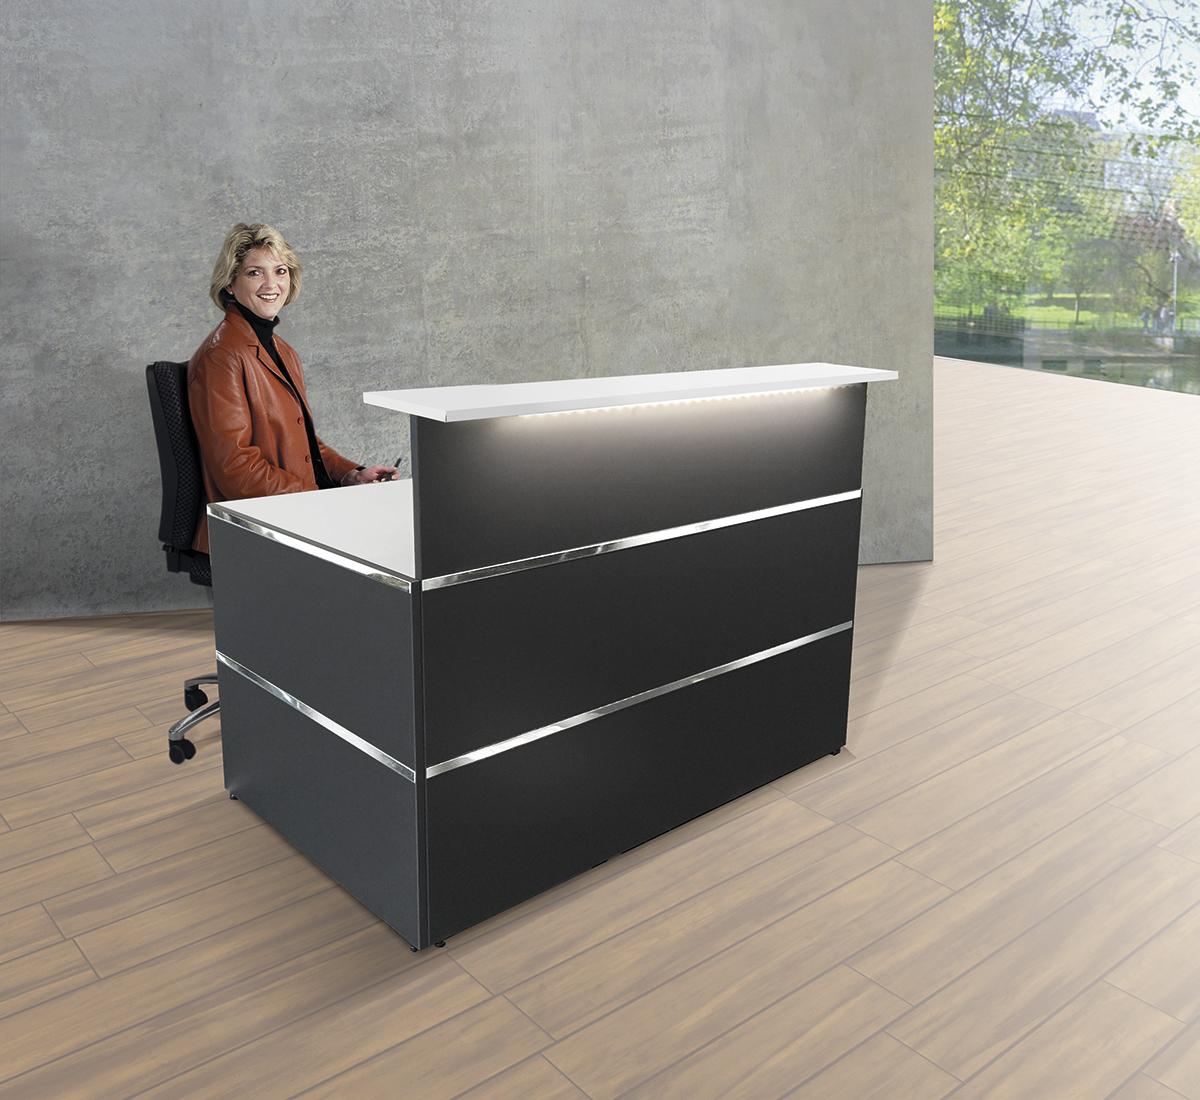 Tresen Design theke atlantis kerkmann office design büromöbel aus bielefeld